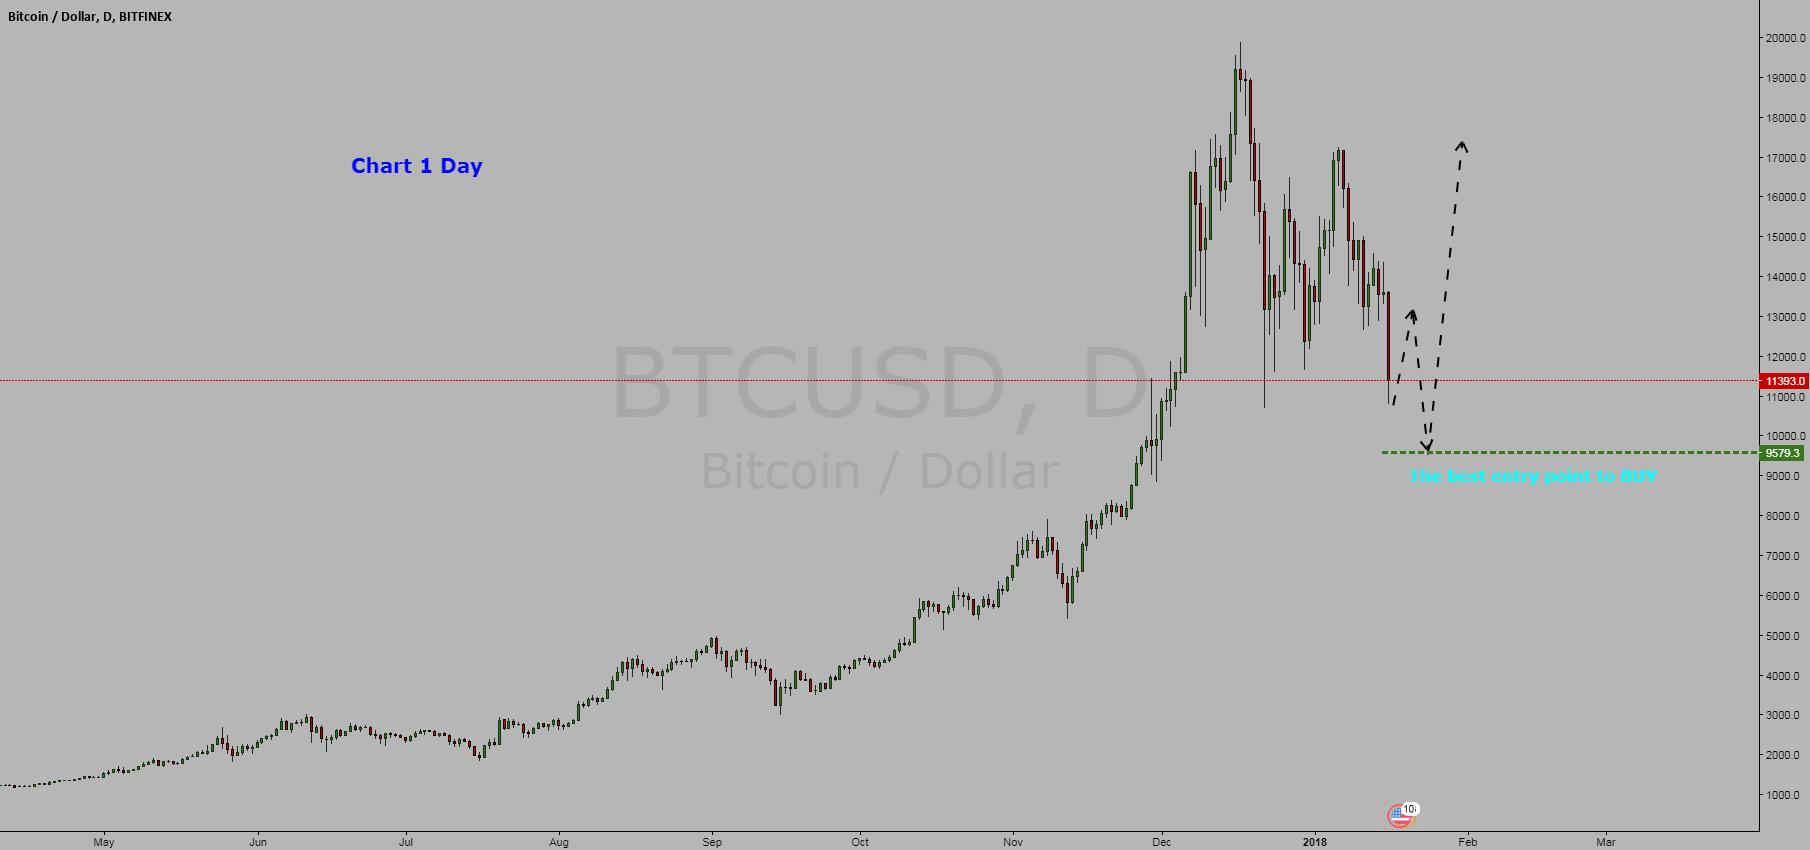 Cryptocurrency Bitcoin / Dollar = BUY